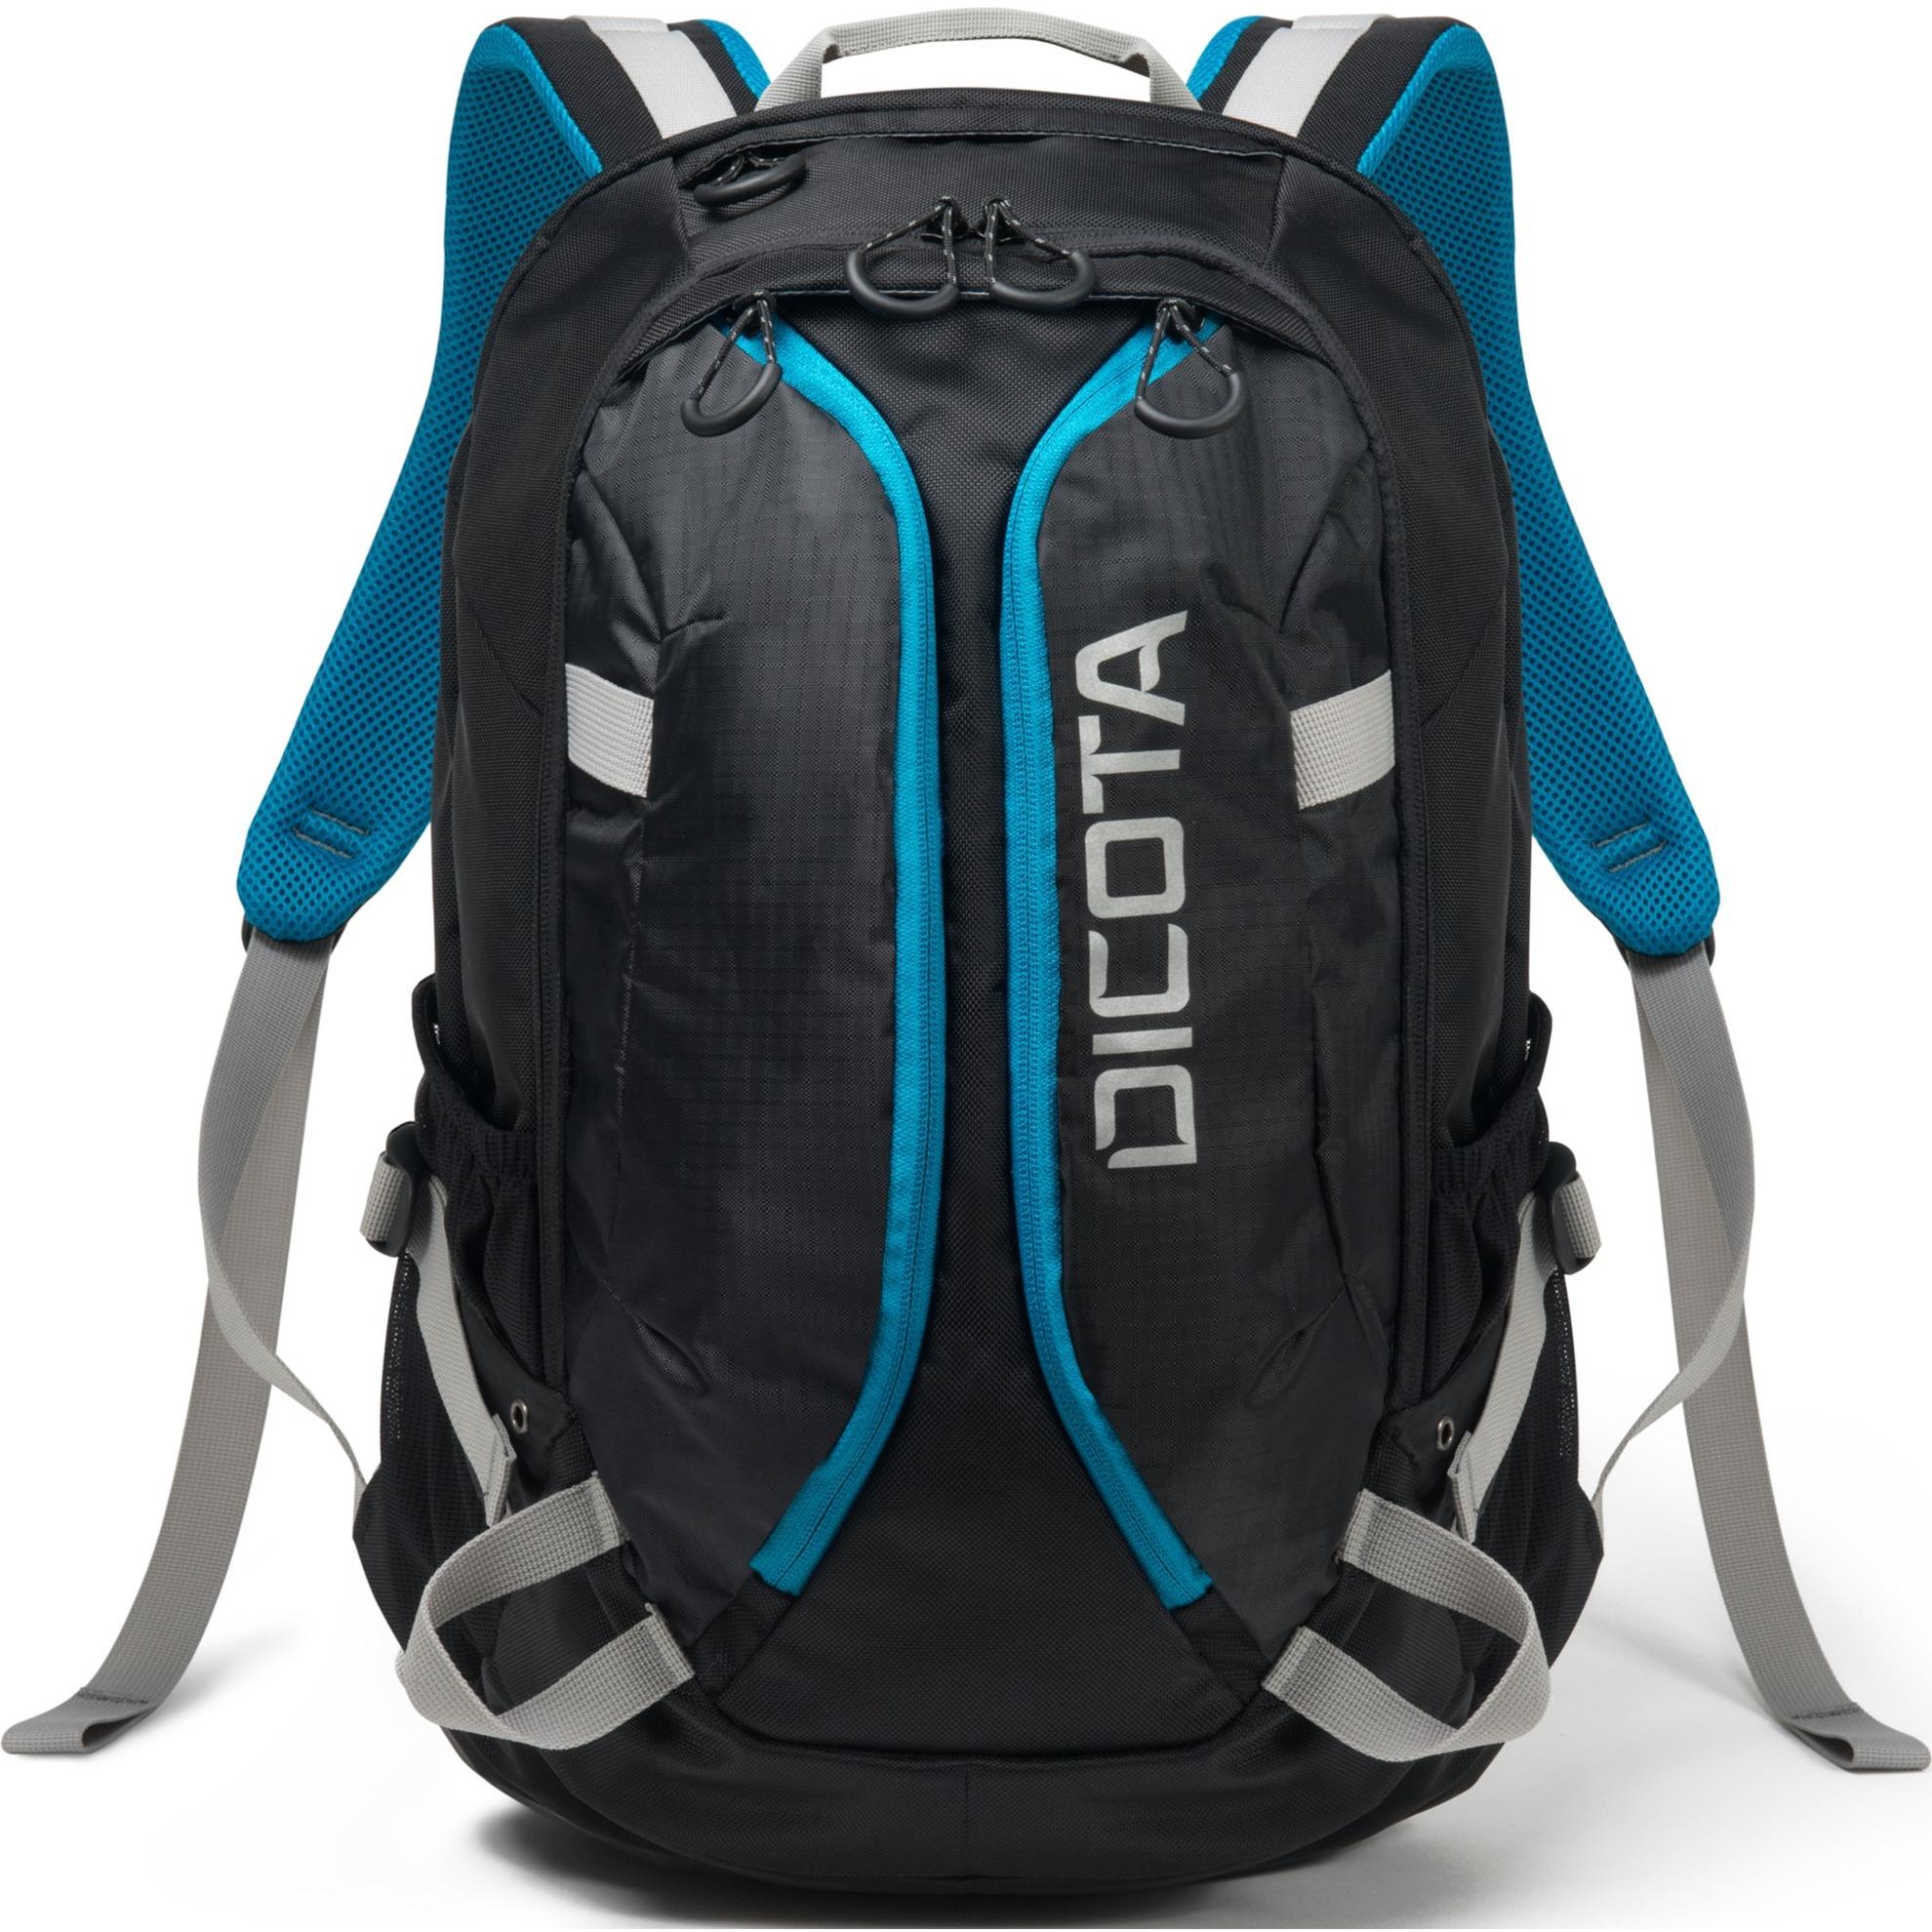 Active mochila Poliéster Negro, Azul